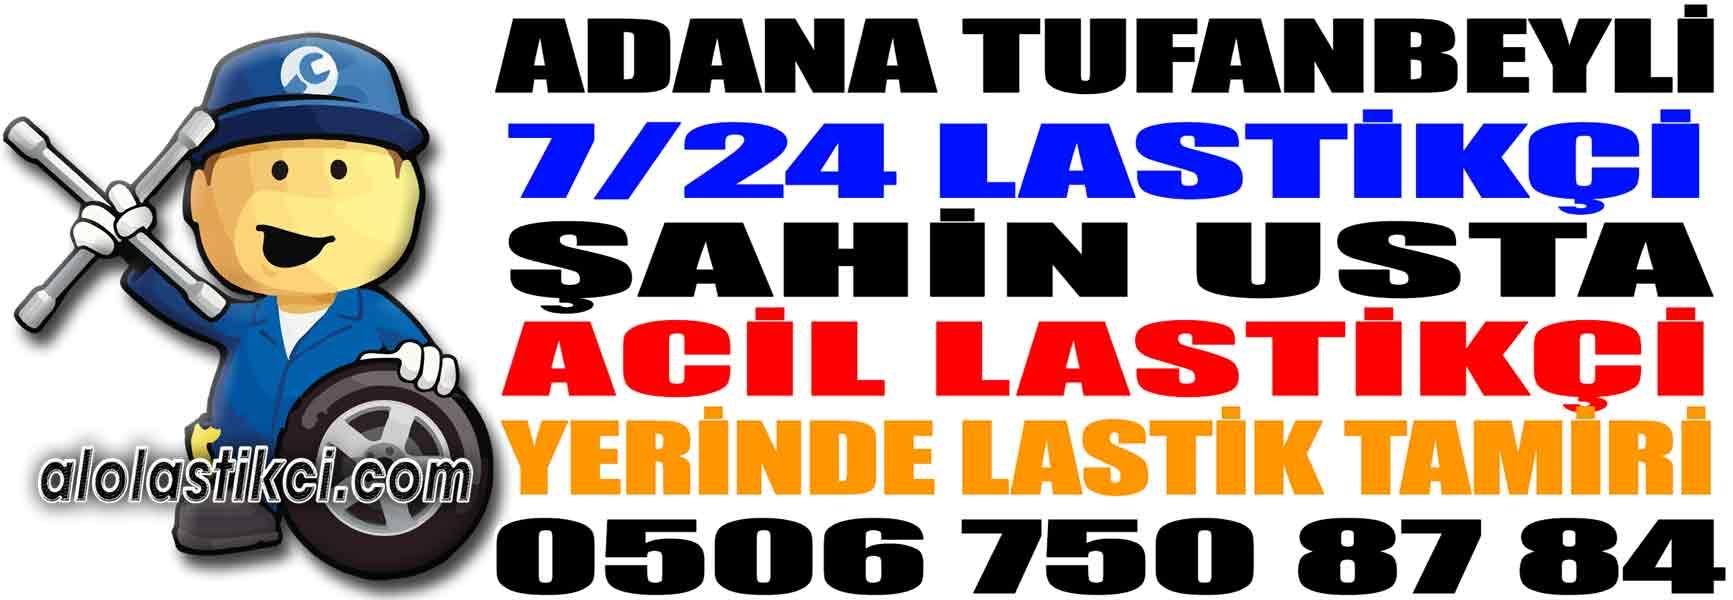 Adana Tufanbeyli Lastikçi